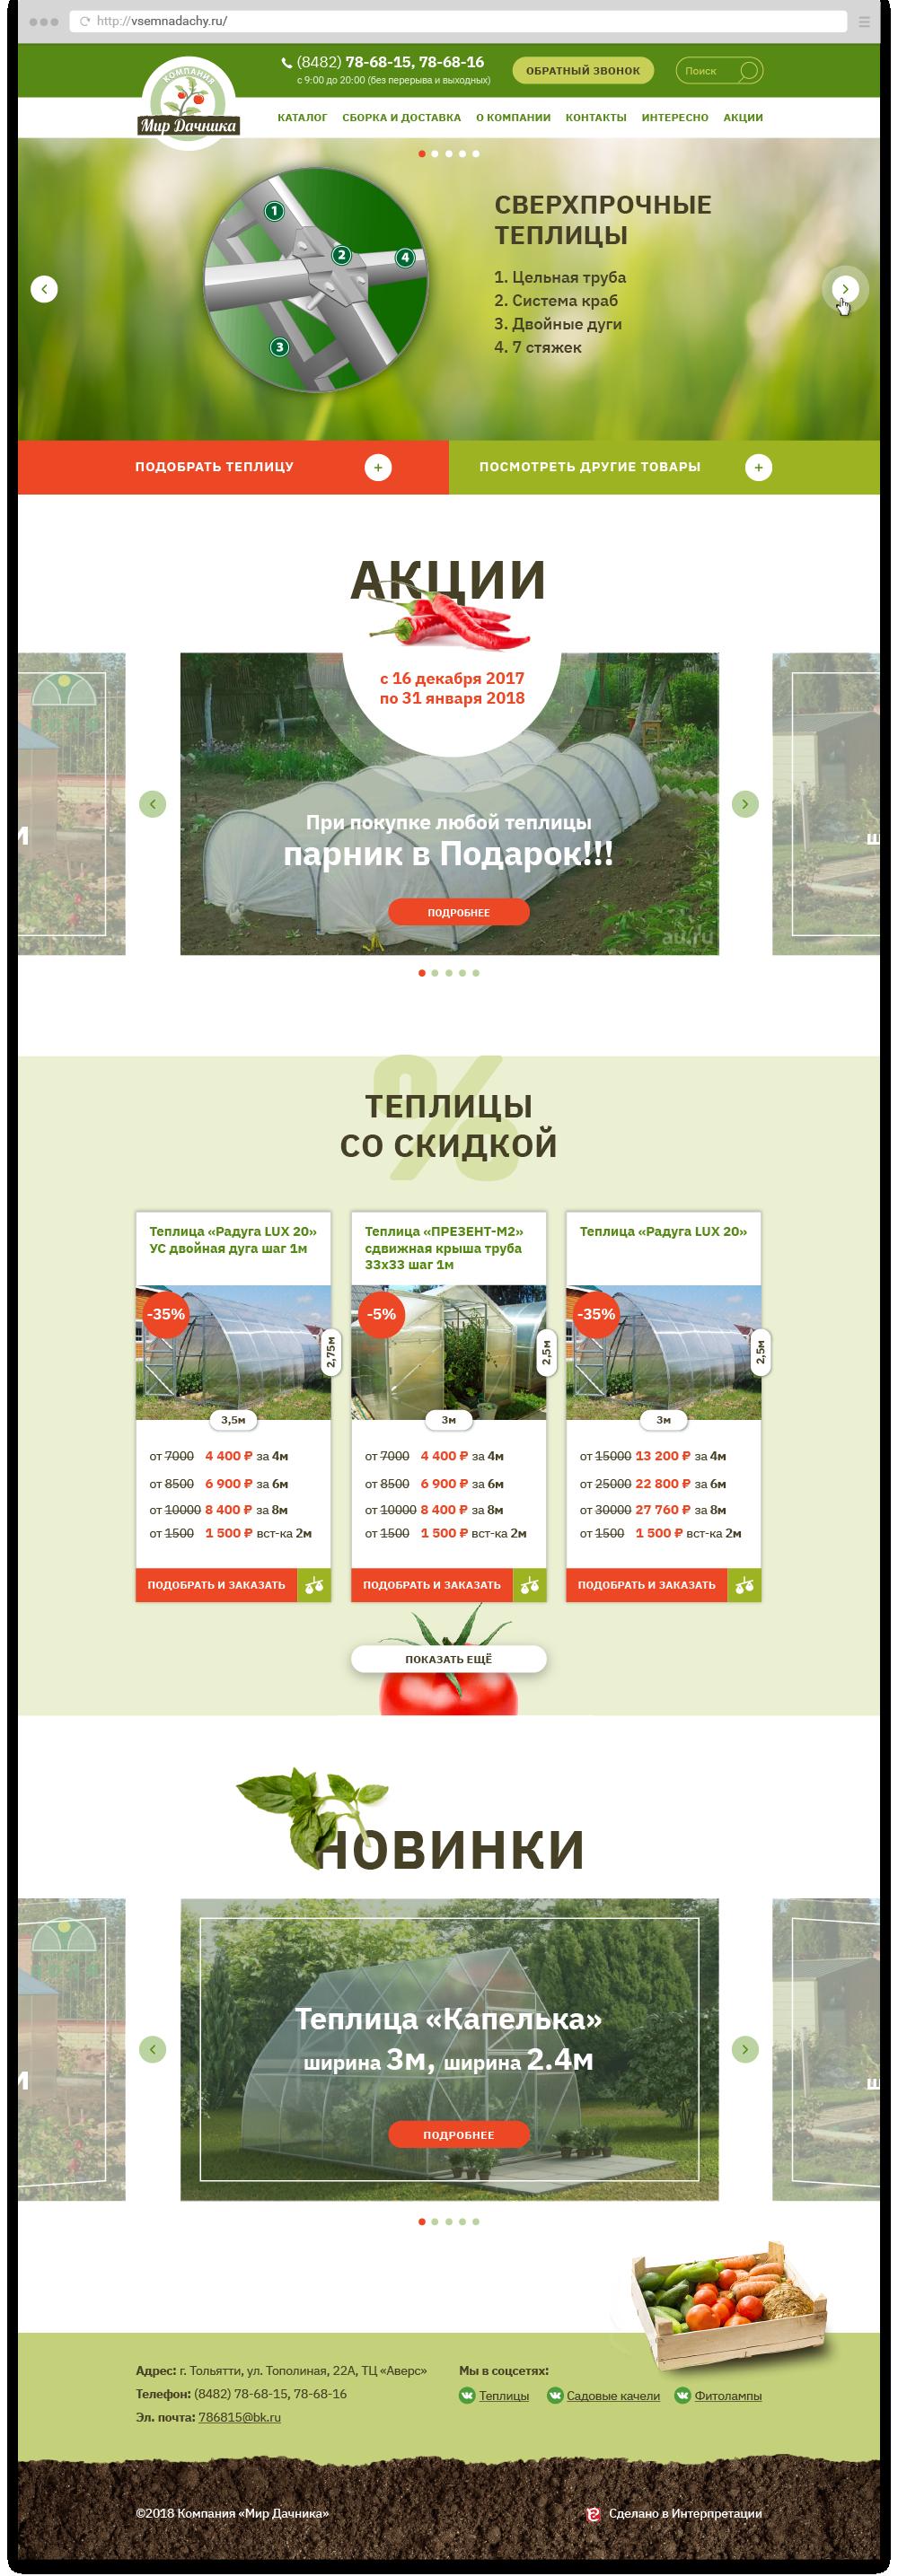 Главная страница сайта.